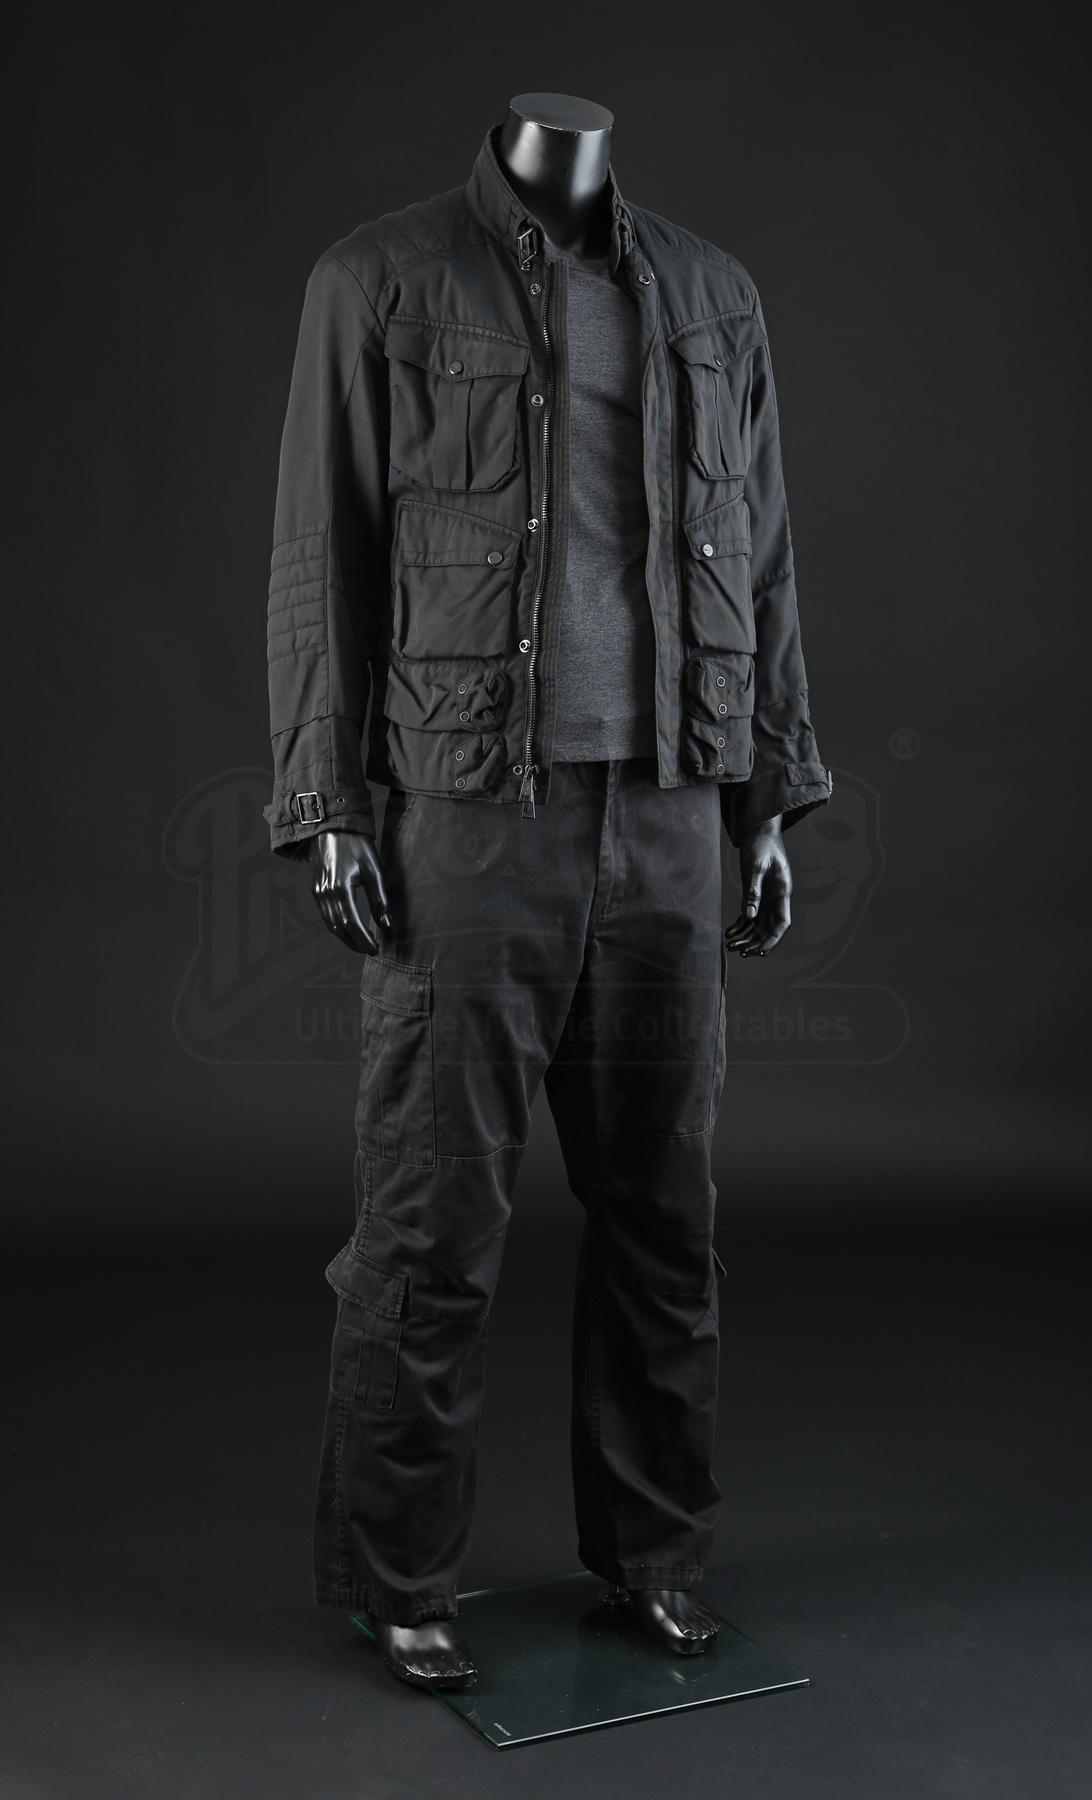 Terminator Genisys: T-800's (Arnold Schwarzenegger) Armory ...